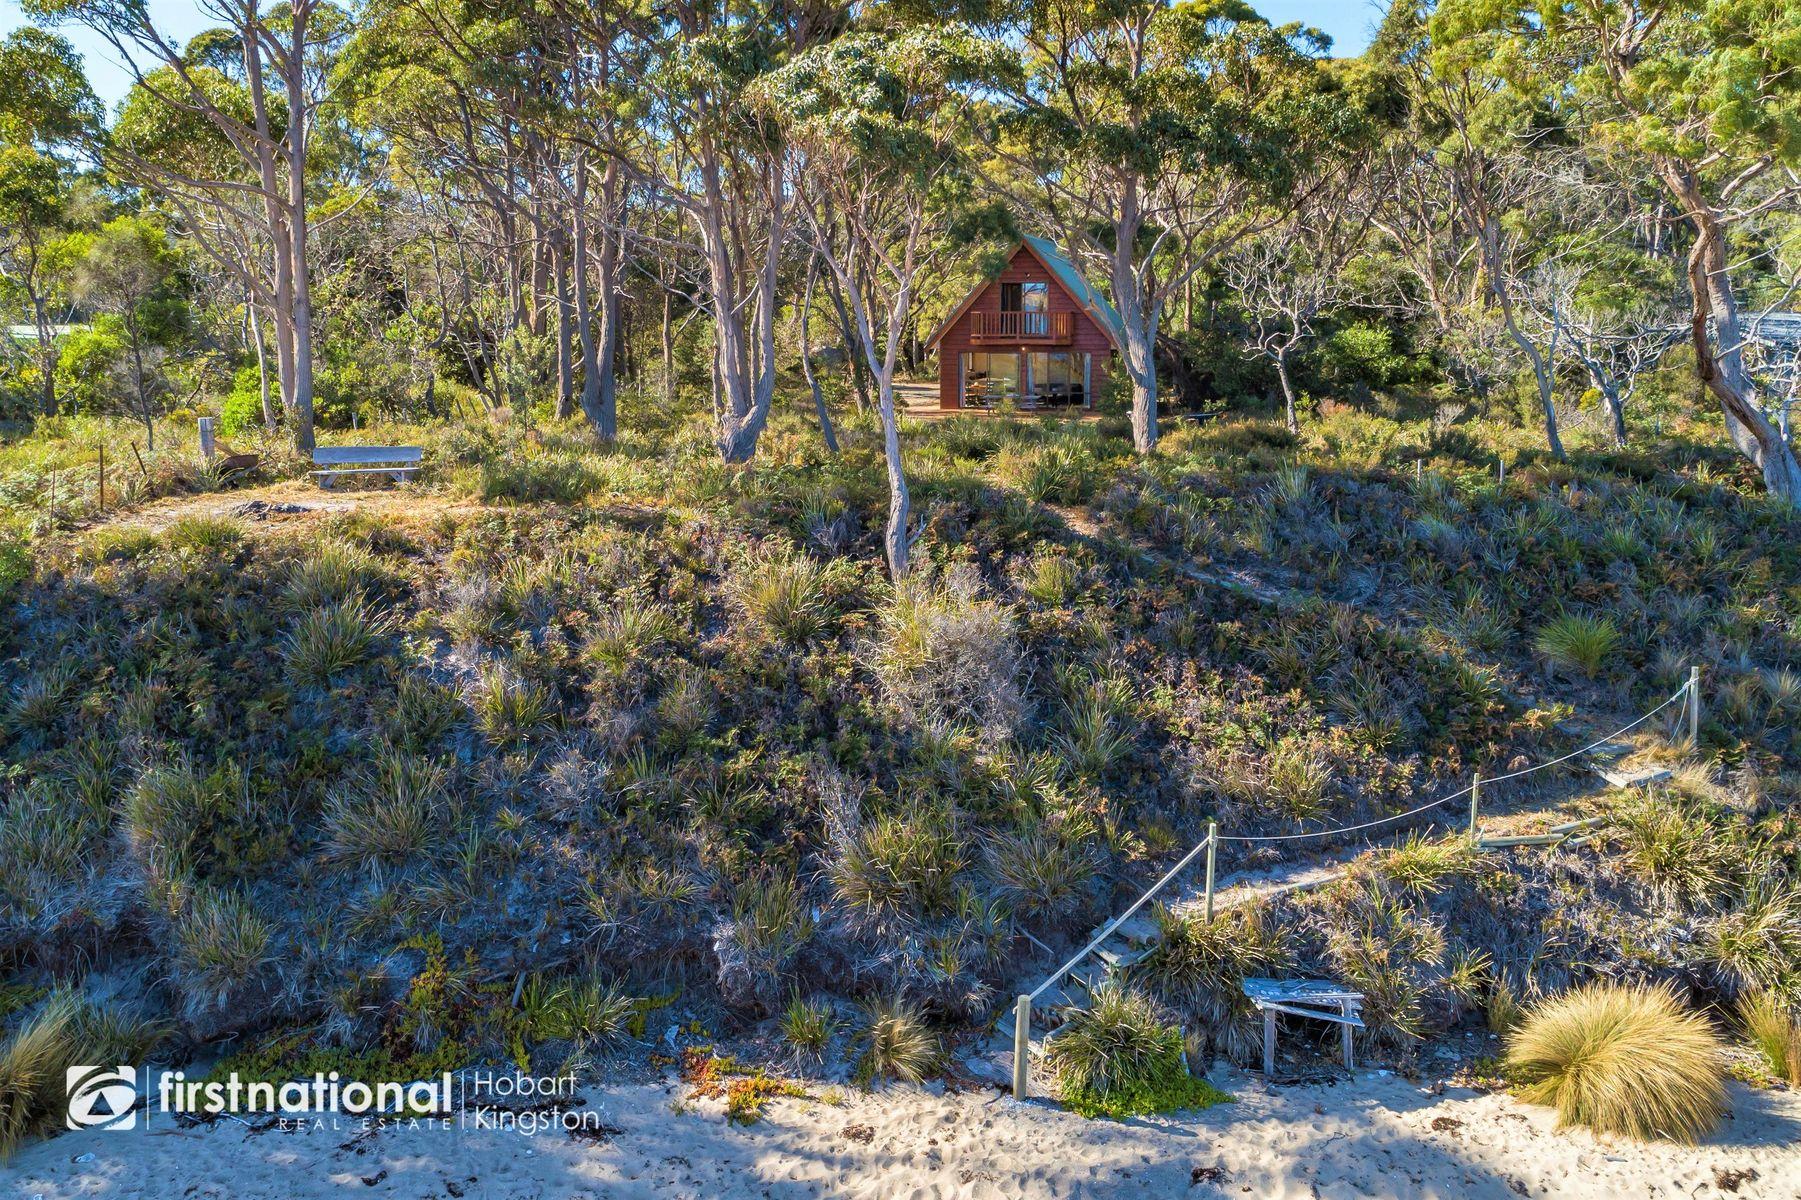 1868 Bruny Island Main Road, Great Bay, TAS 7150